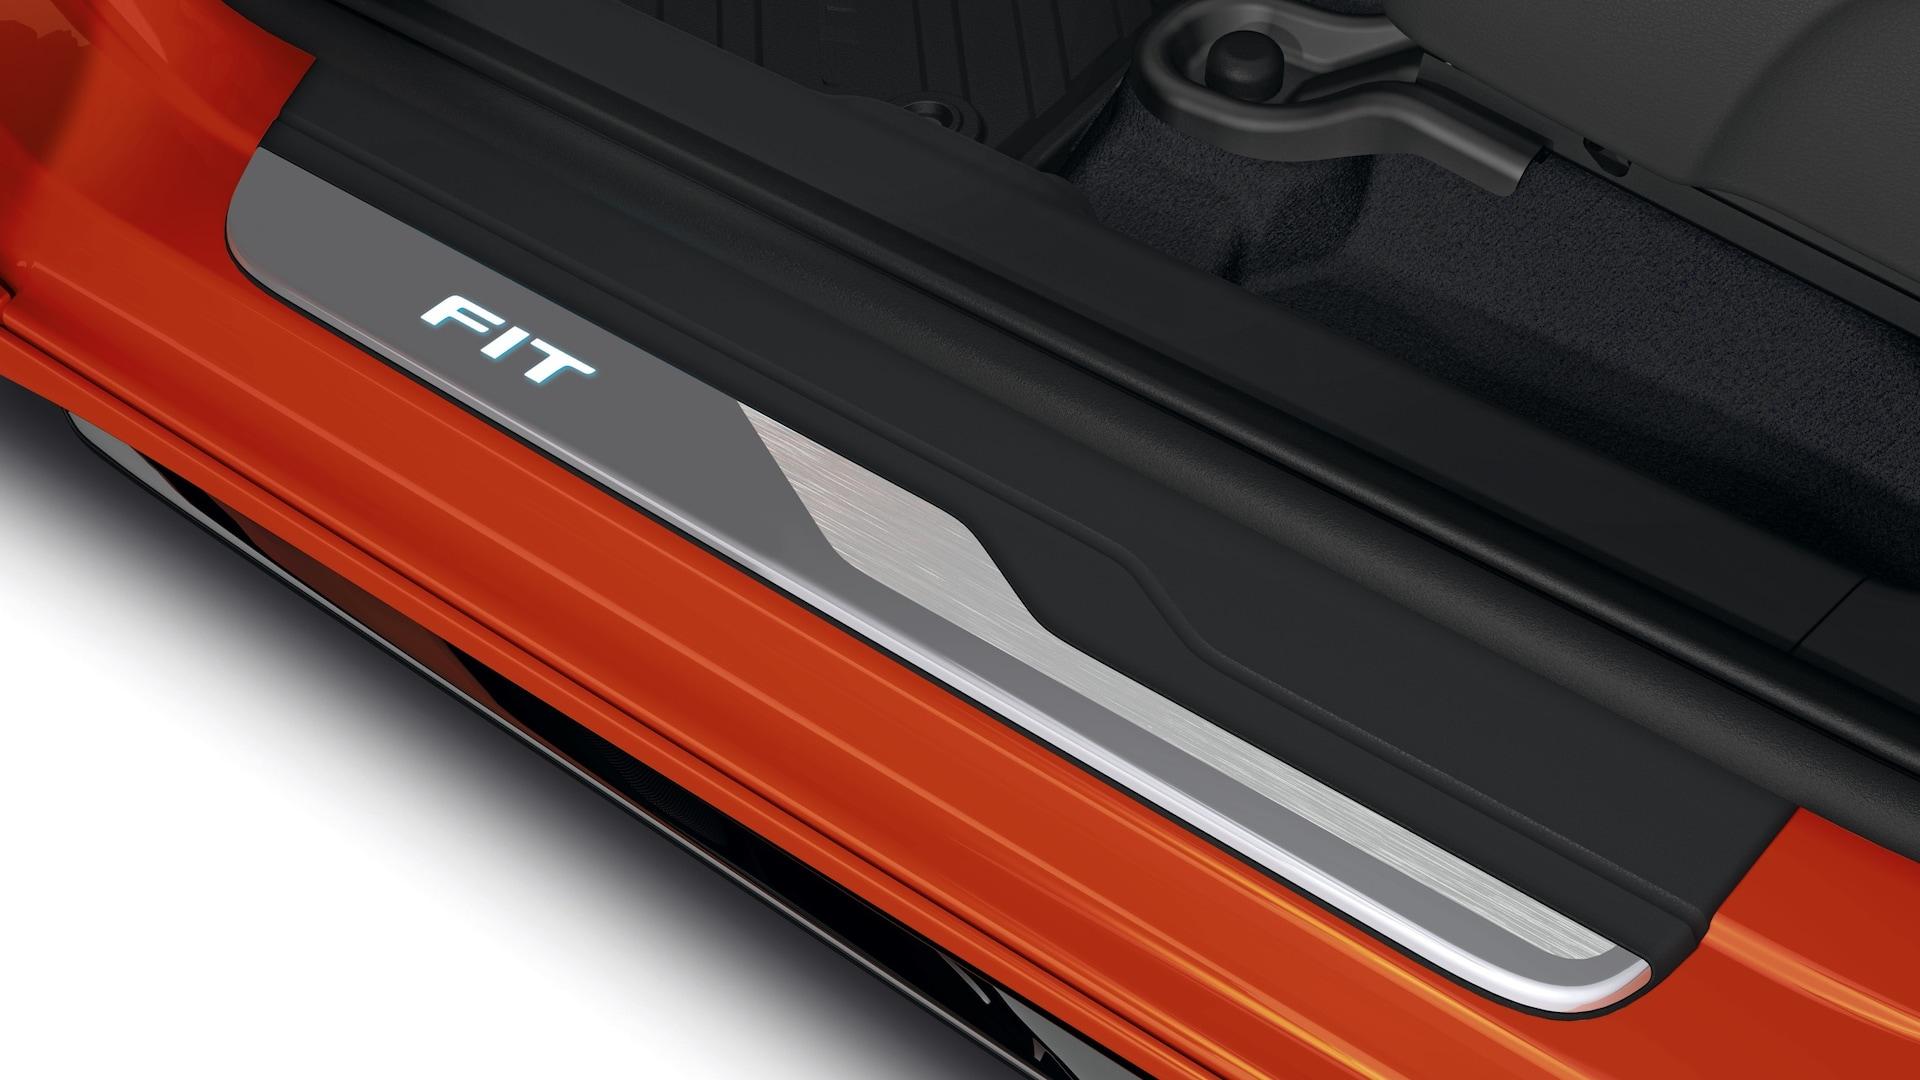 Detalle del umbral de la puerta iluminado en el Honda Fit2020.